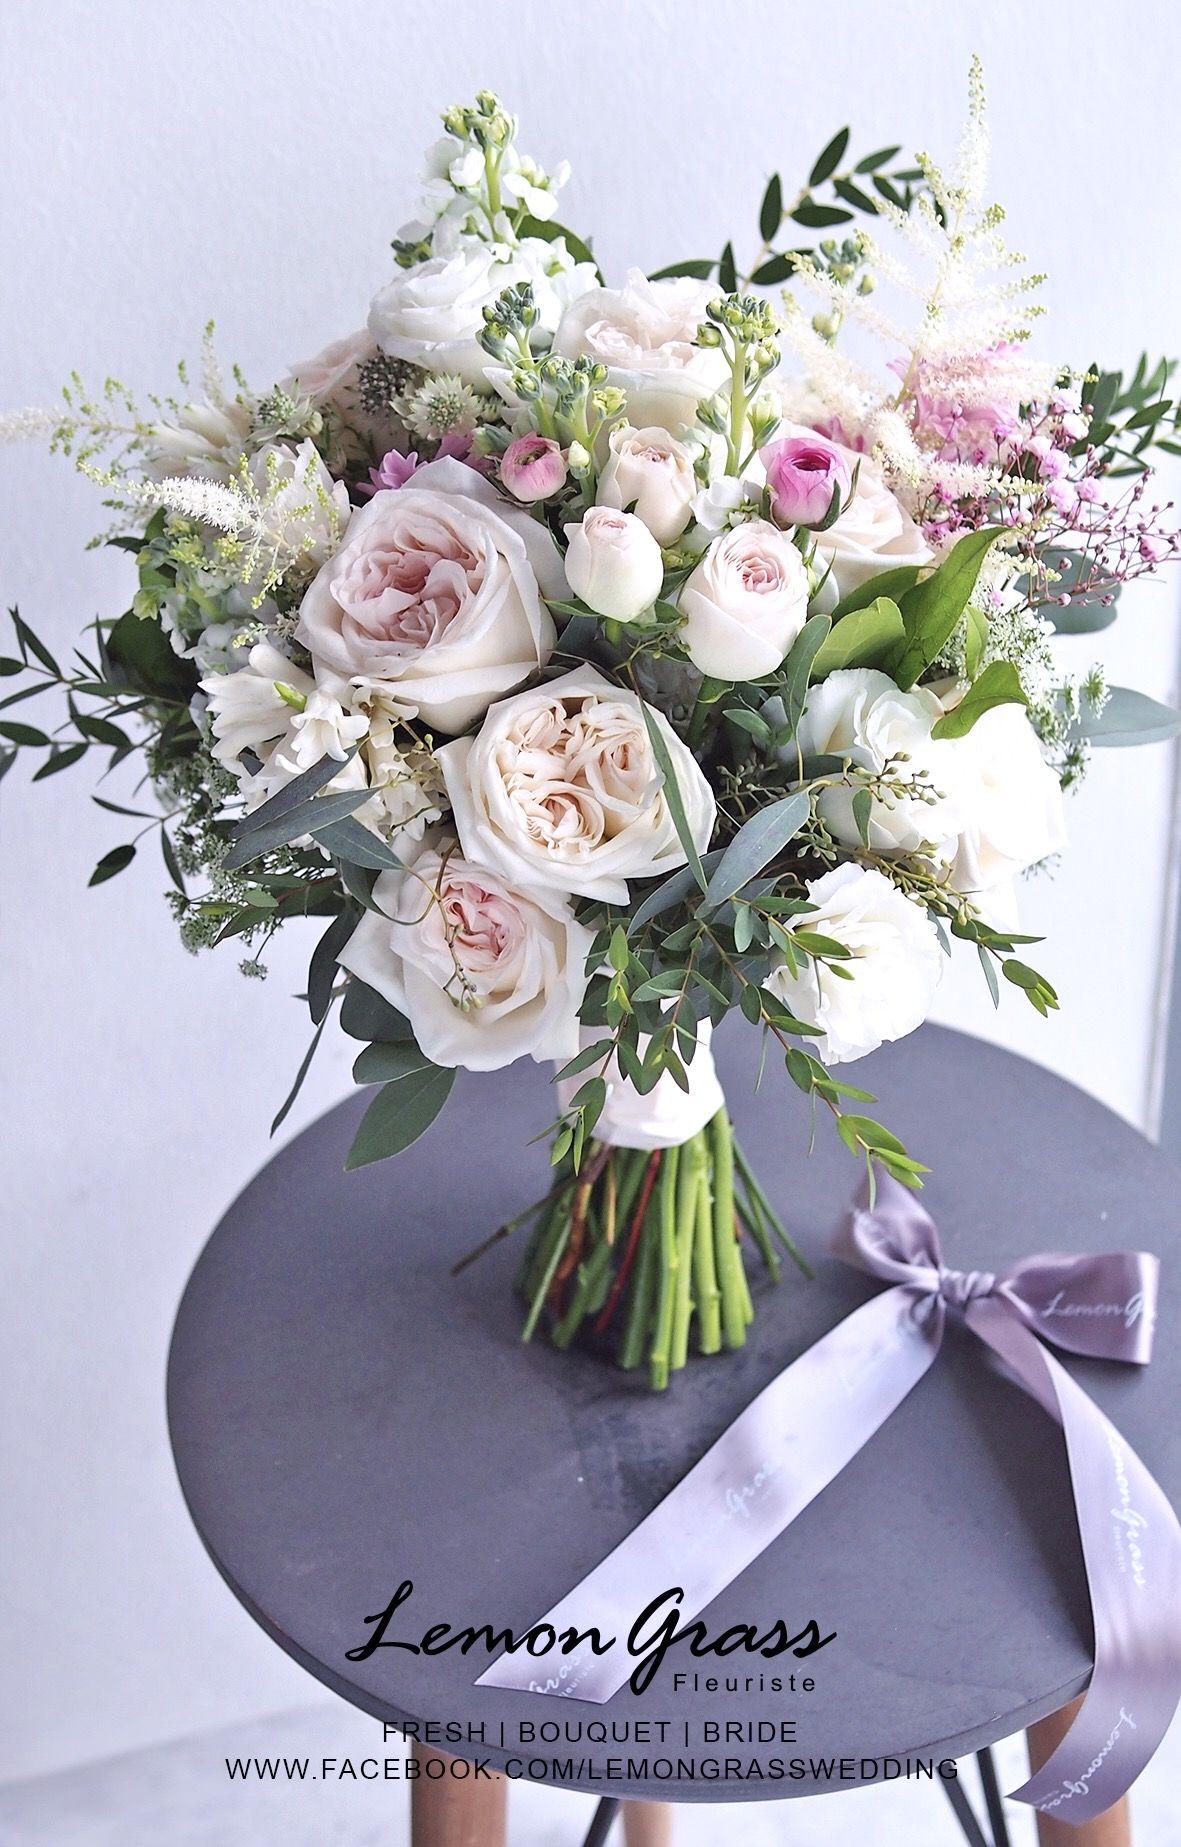 Lemongrass wedding beautiful rosegardening and rose design lemongrass wedding beautiful izmirmasajfo